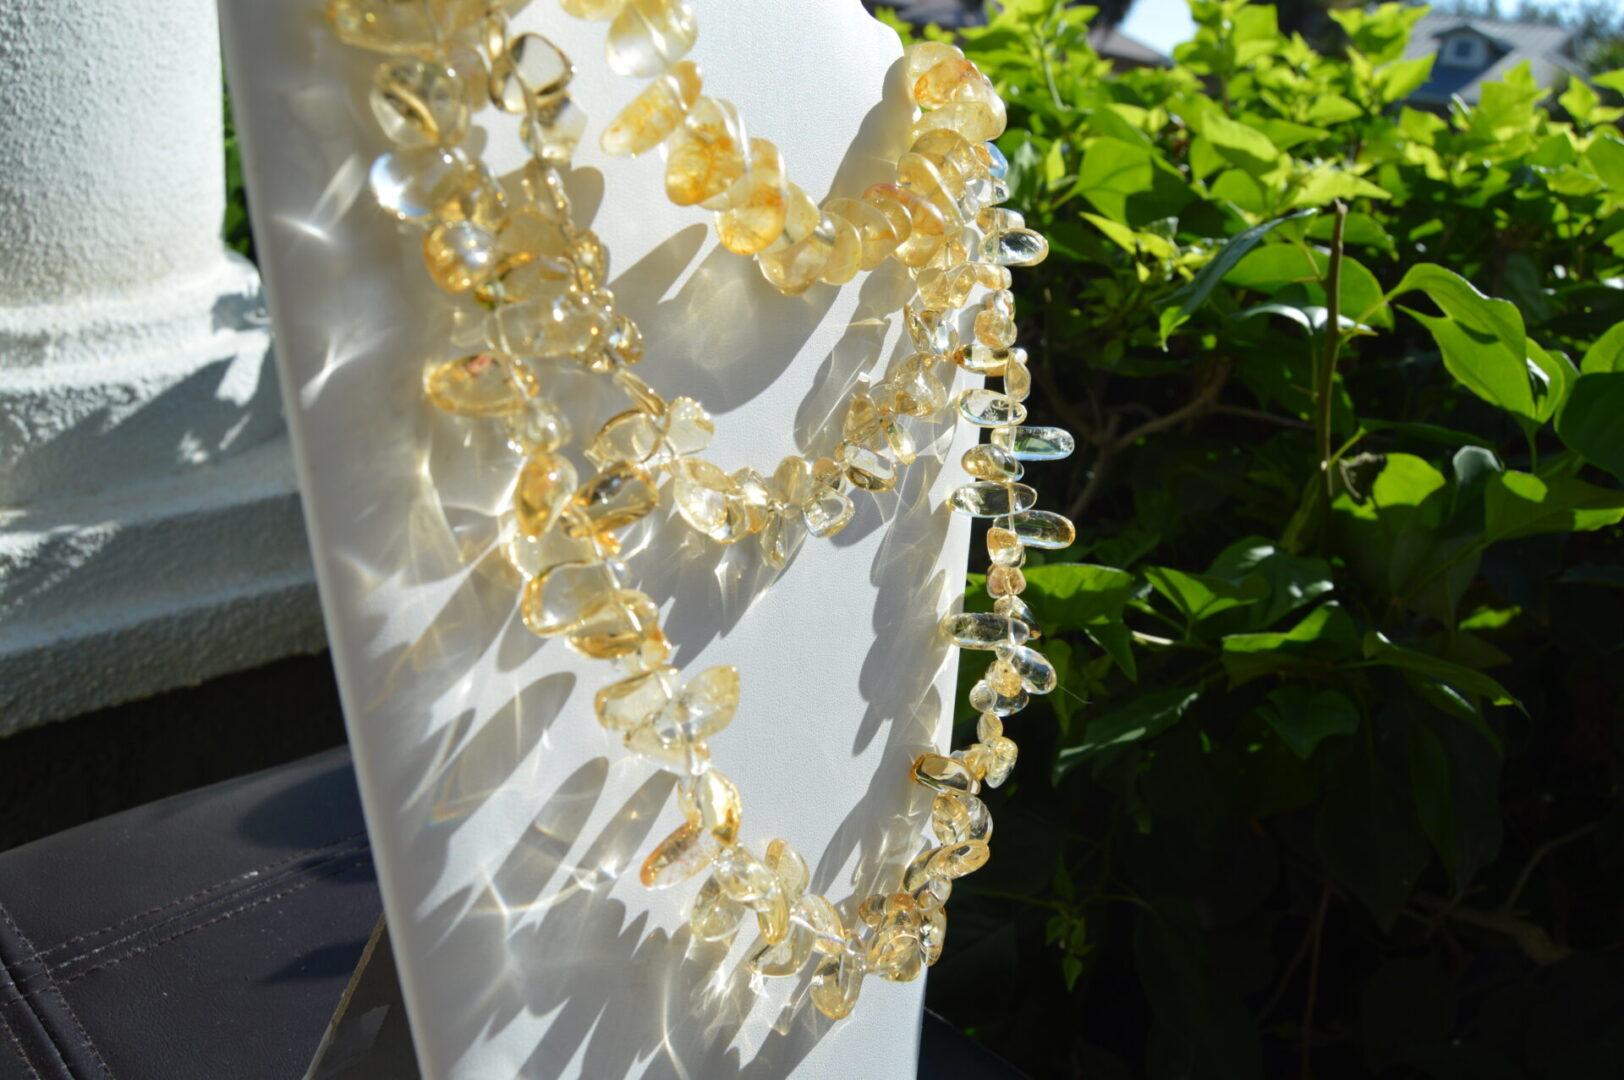 A Citrine necklace